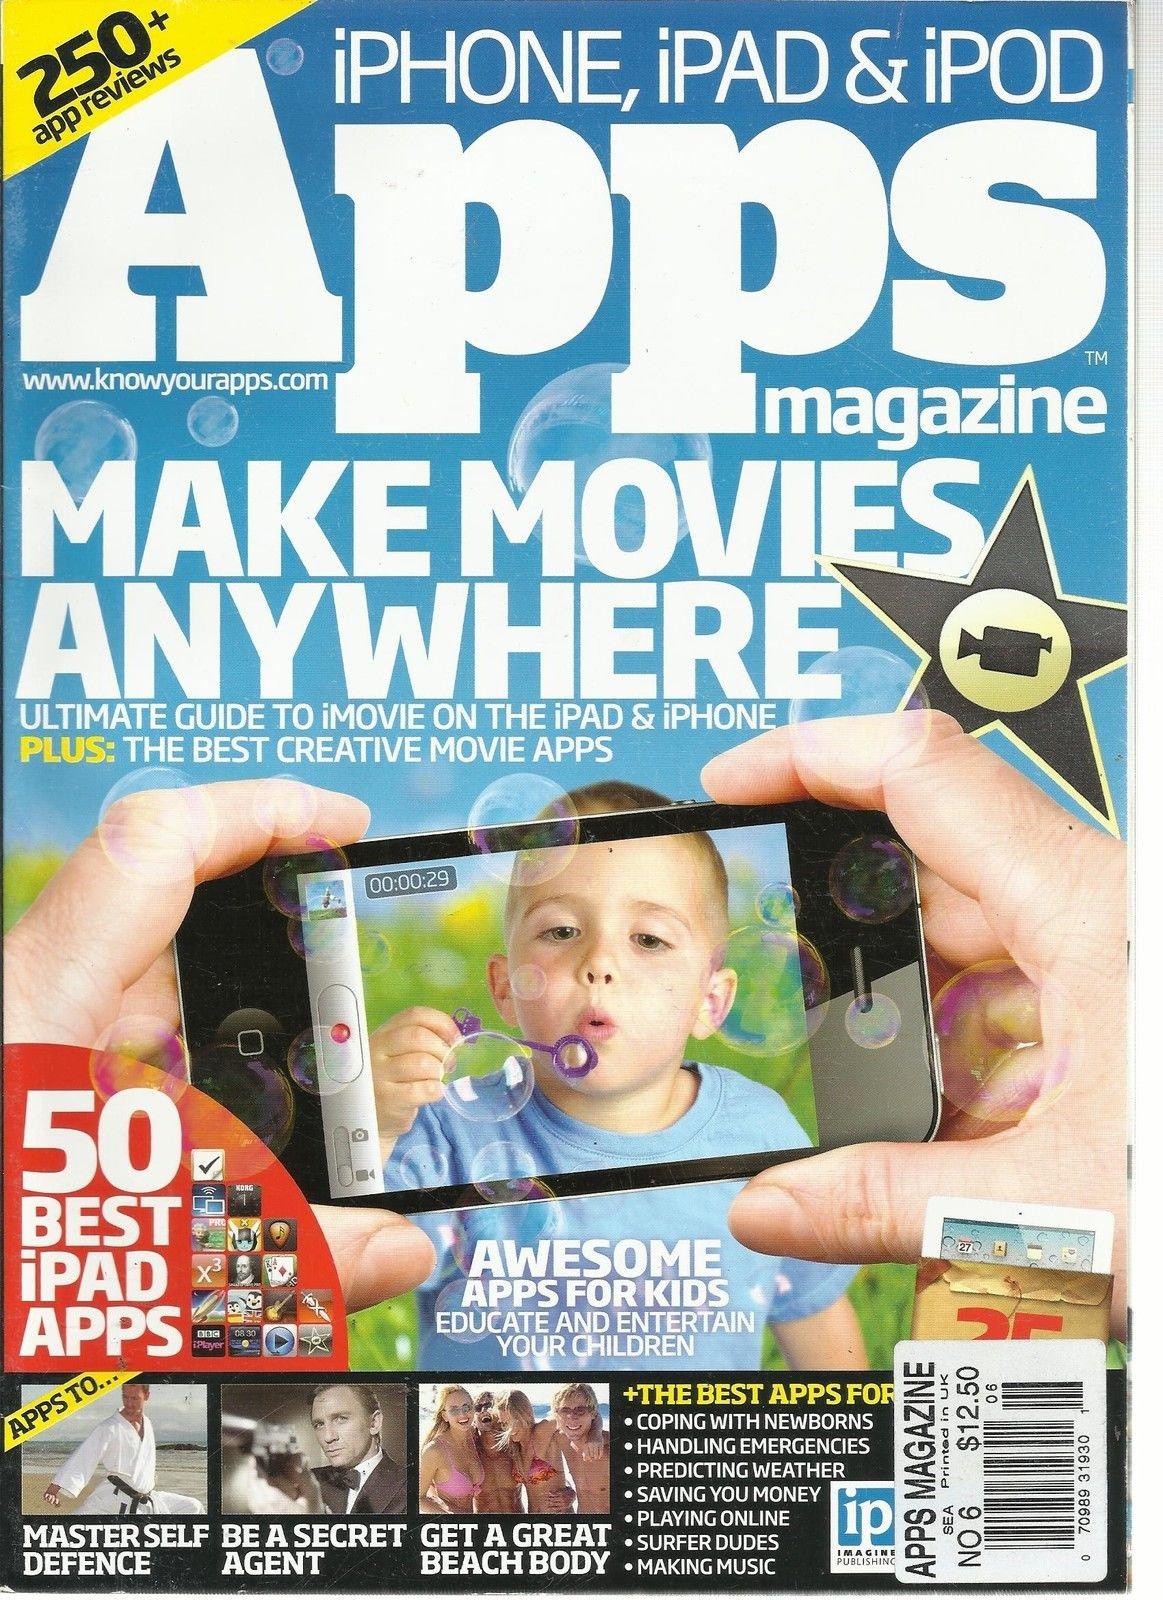 iPHONE, iPAD & iPOD APPS MAGAZINE, NO.6 (MAKE MOVIE ANY WHERE) 250 APP REVIEWS